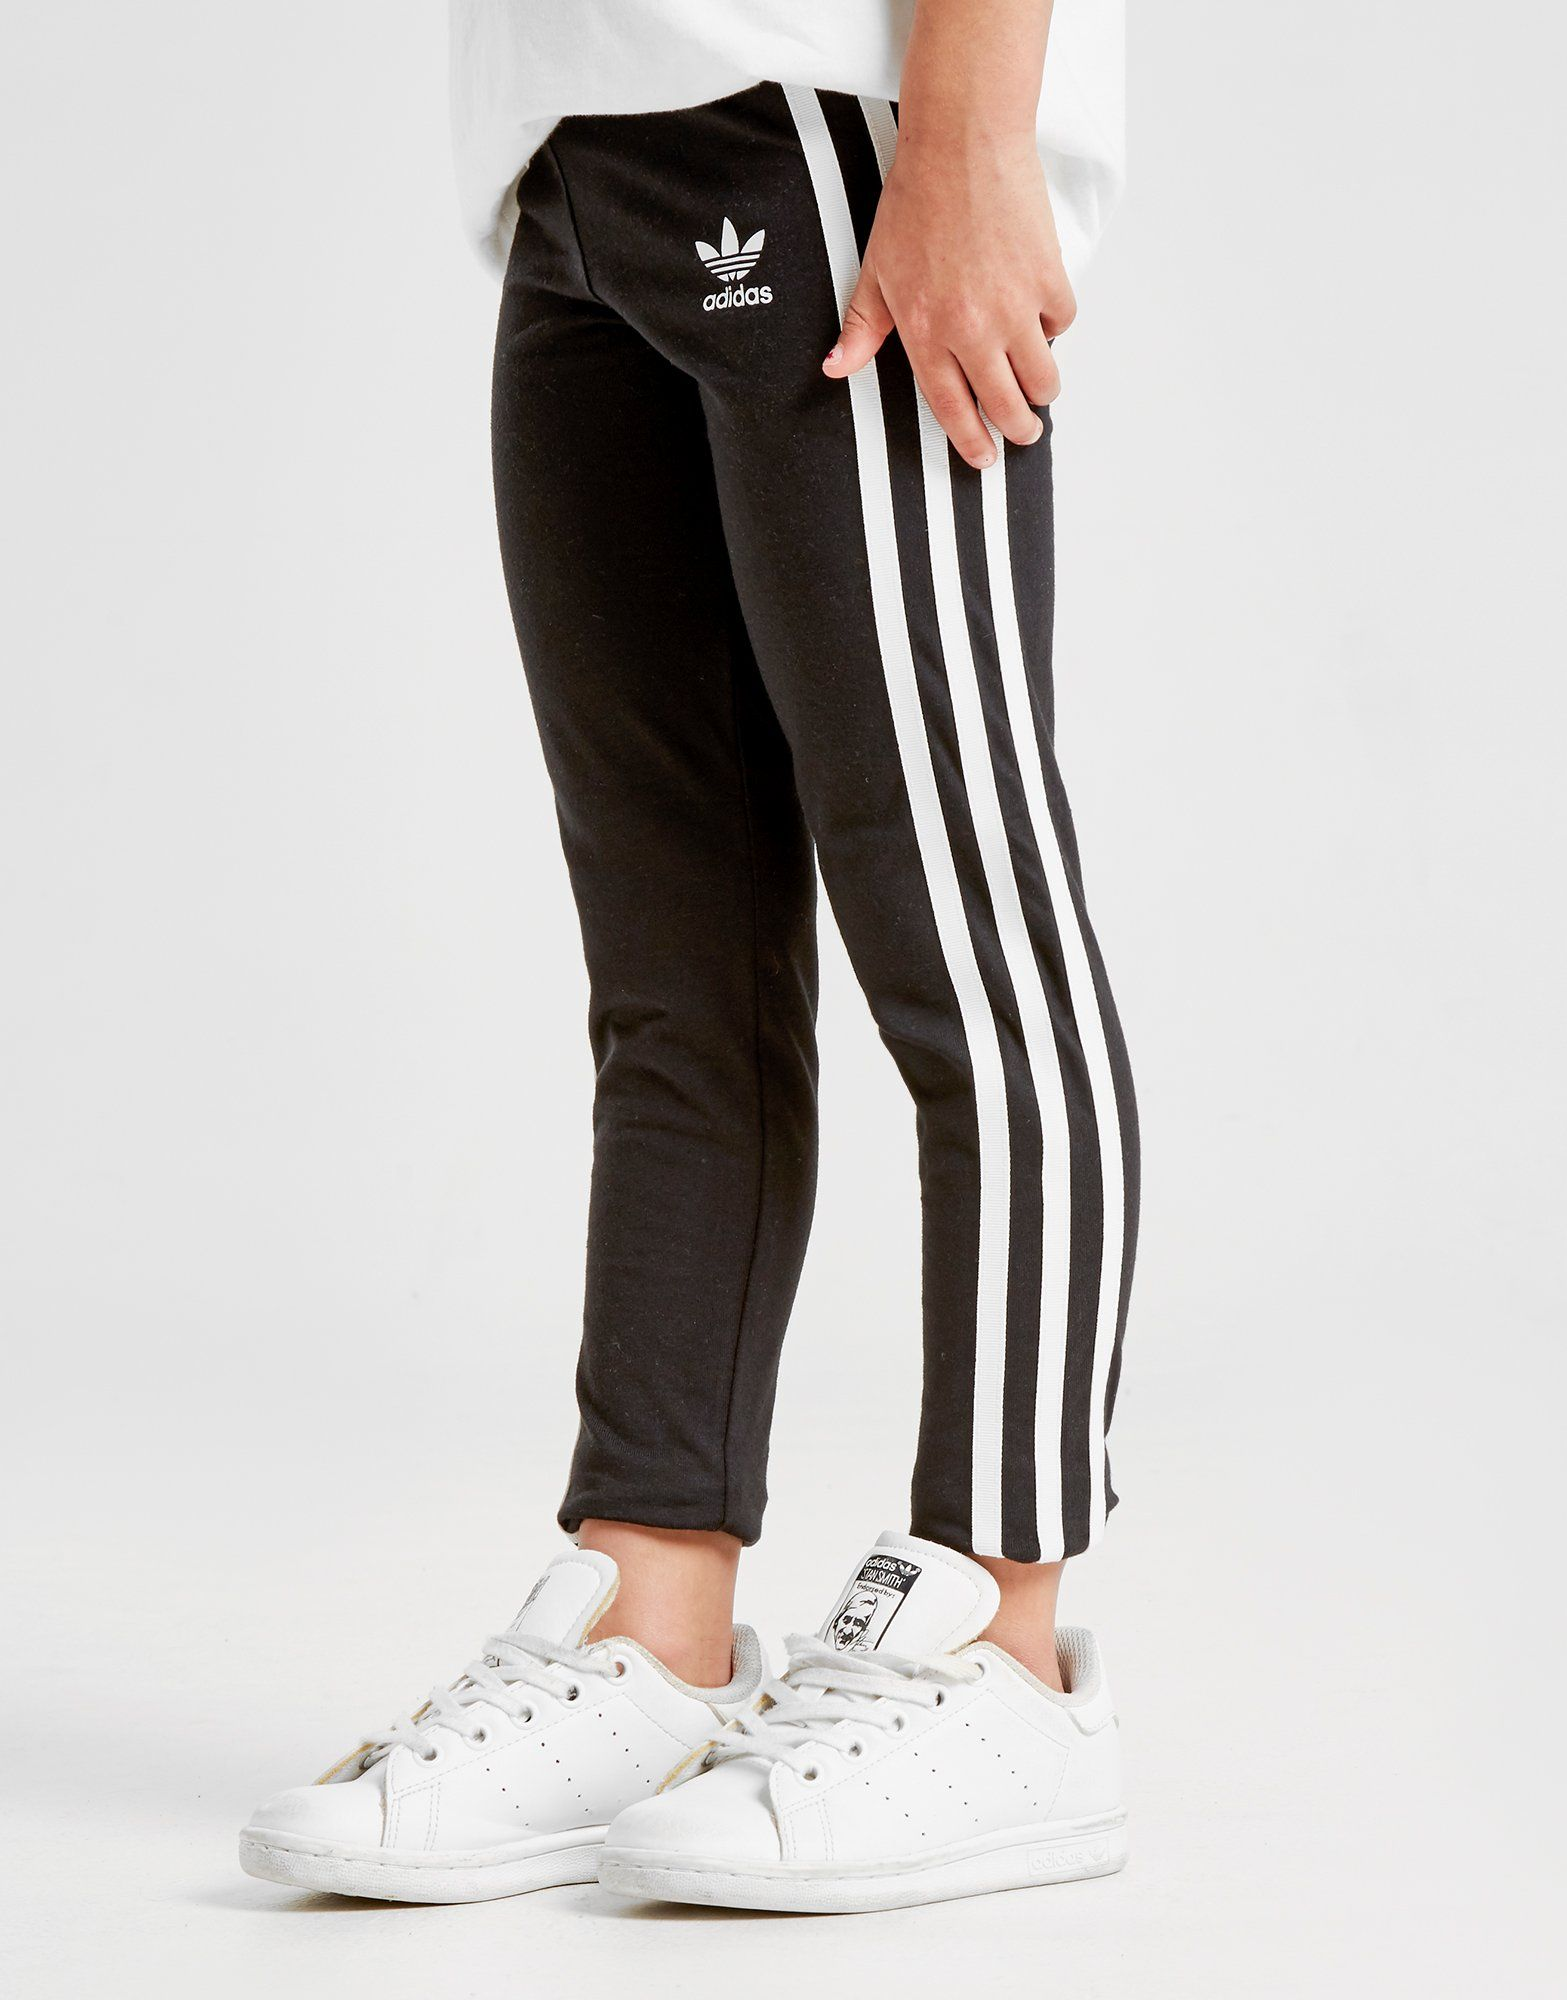 adidas Originals Girls' 3-Stripes Leggings Kinderen